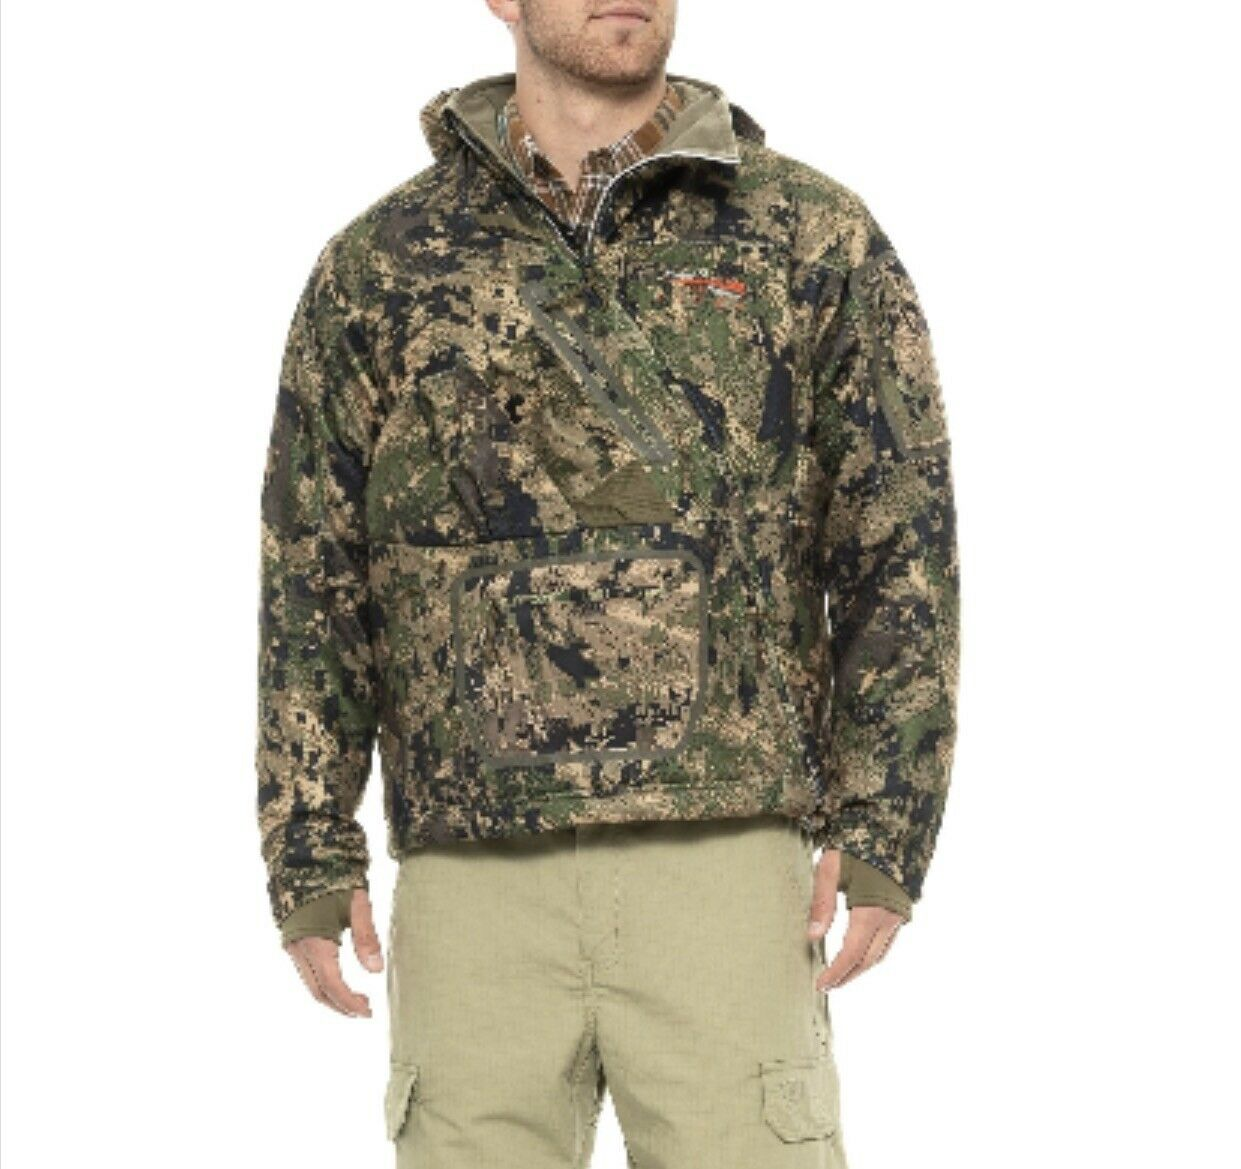 Sitka Fanatic Ground Forest Hunting Jacket Talla- XL